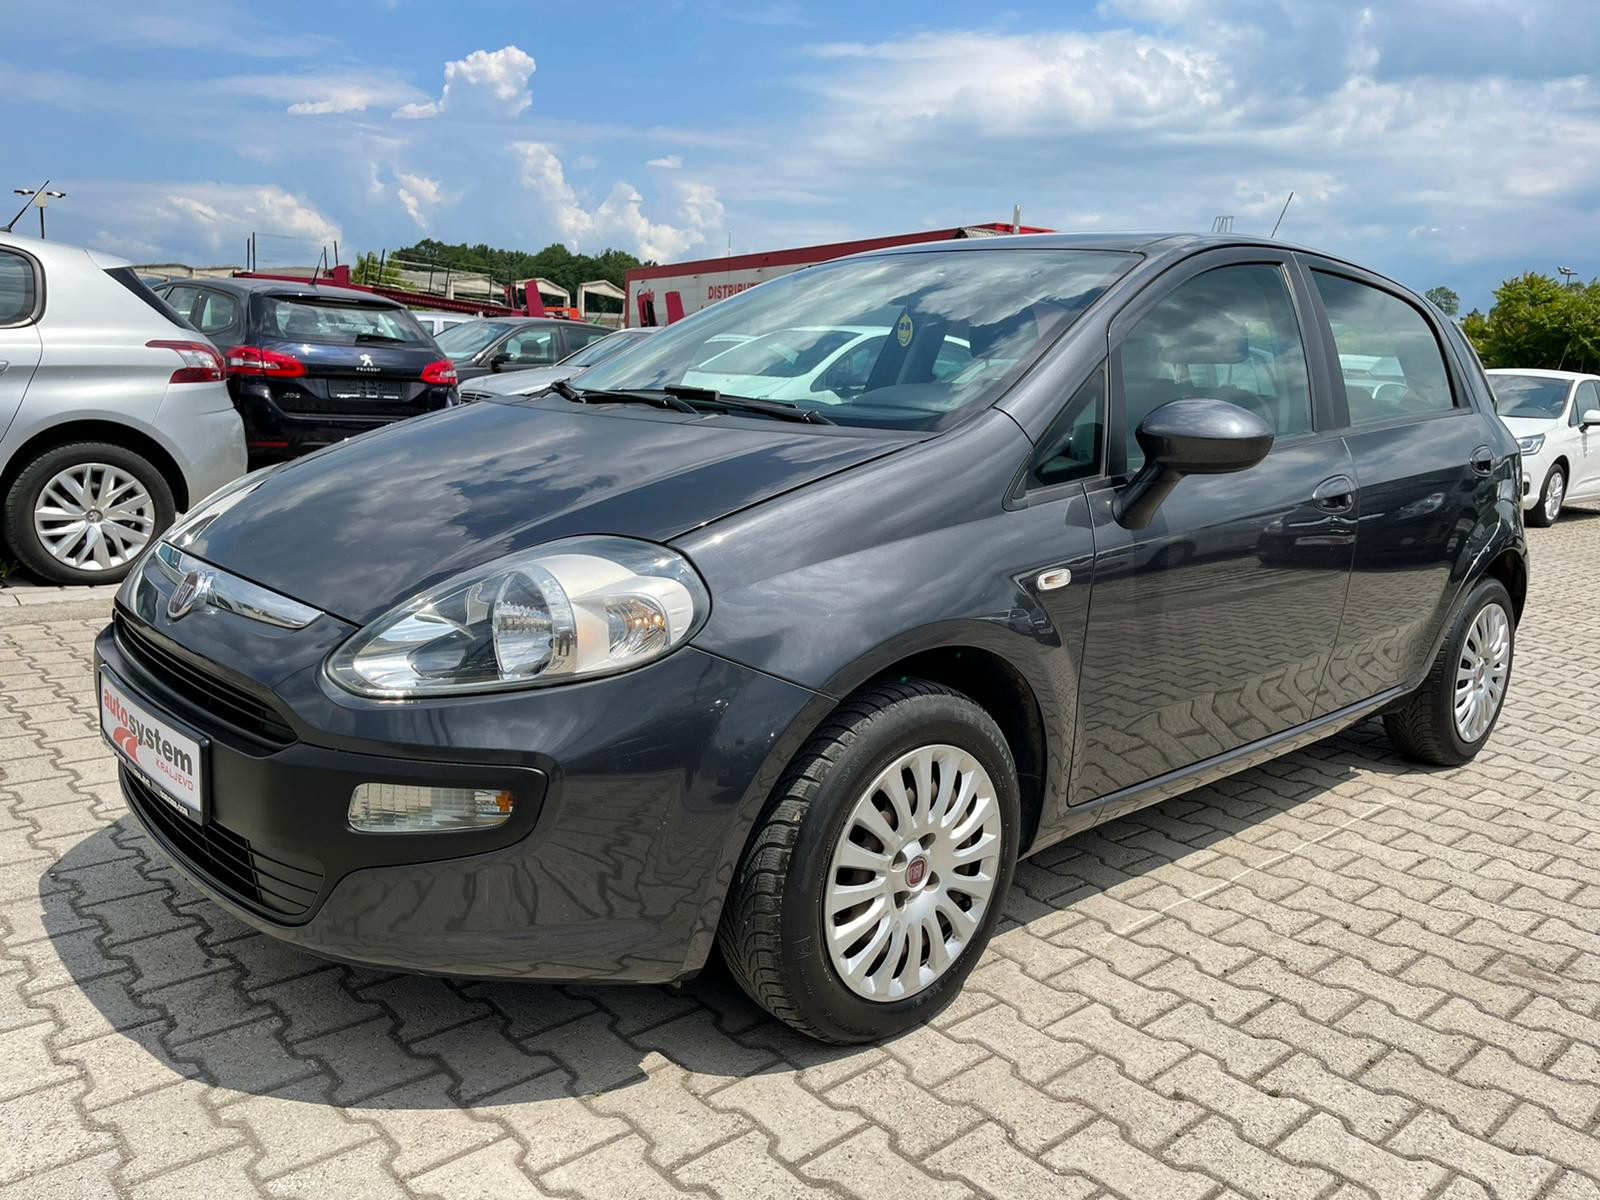 Fiat Punto 1.3 MJT